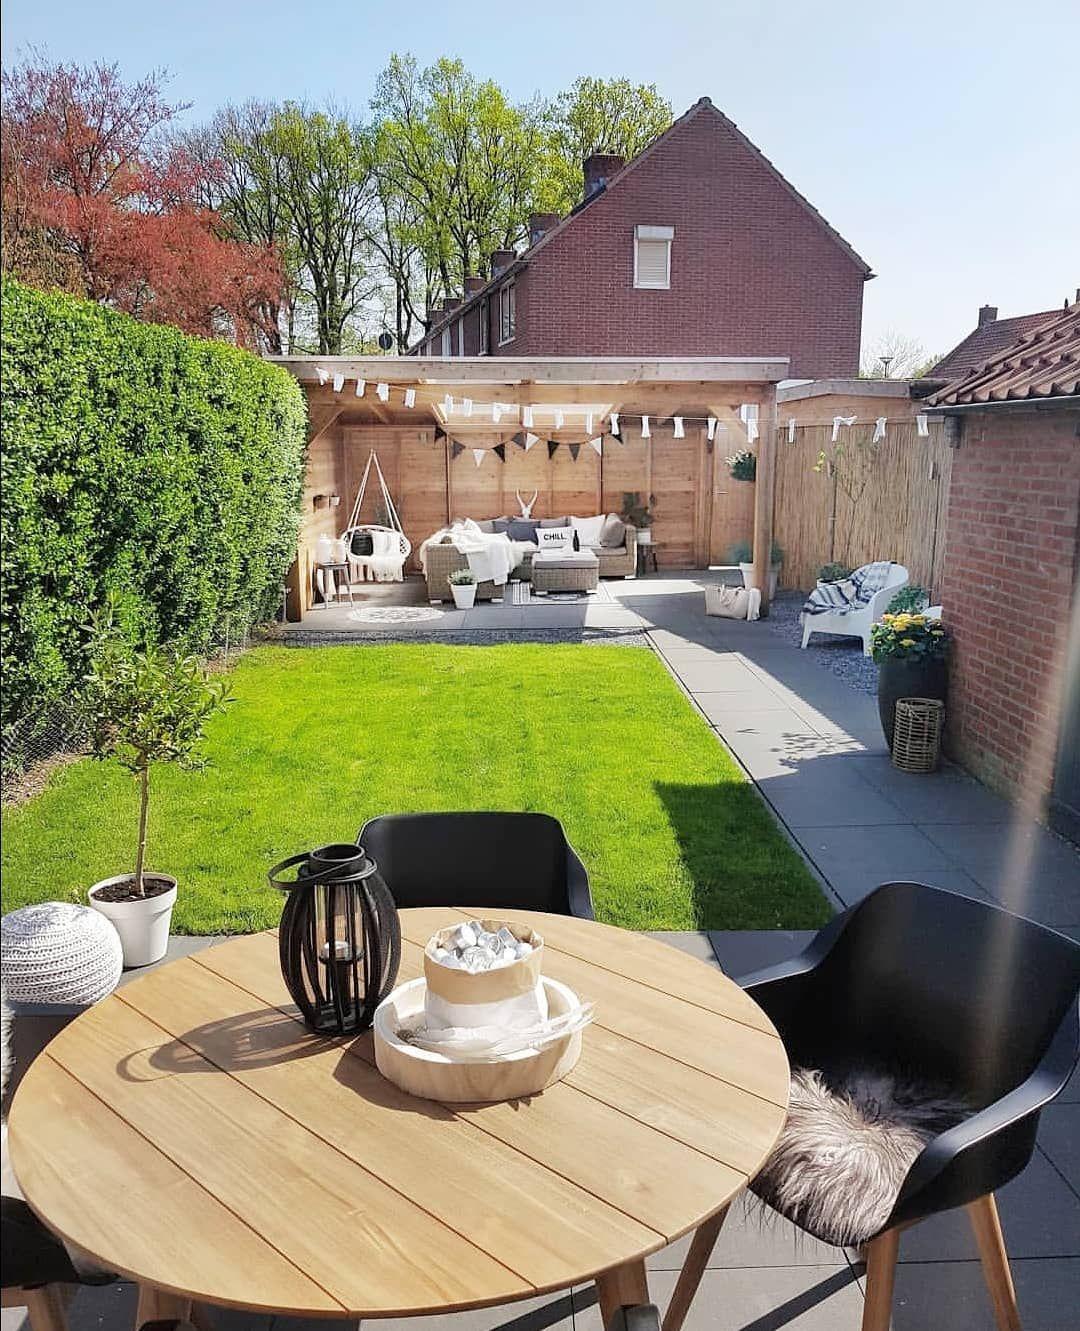 Green Garden Tuinset.Mynordicroom Lounge Loungeset Tuinset Urbanjungleblog Instahome